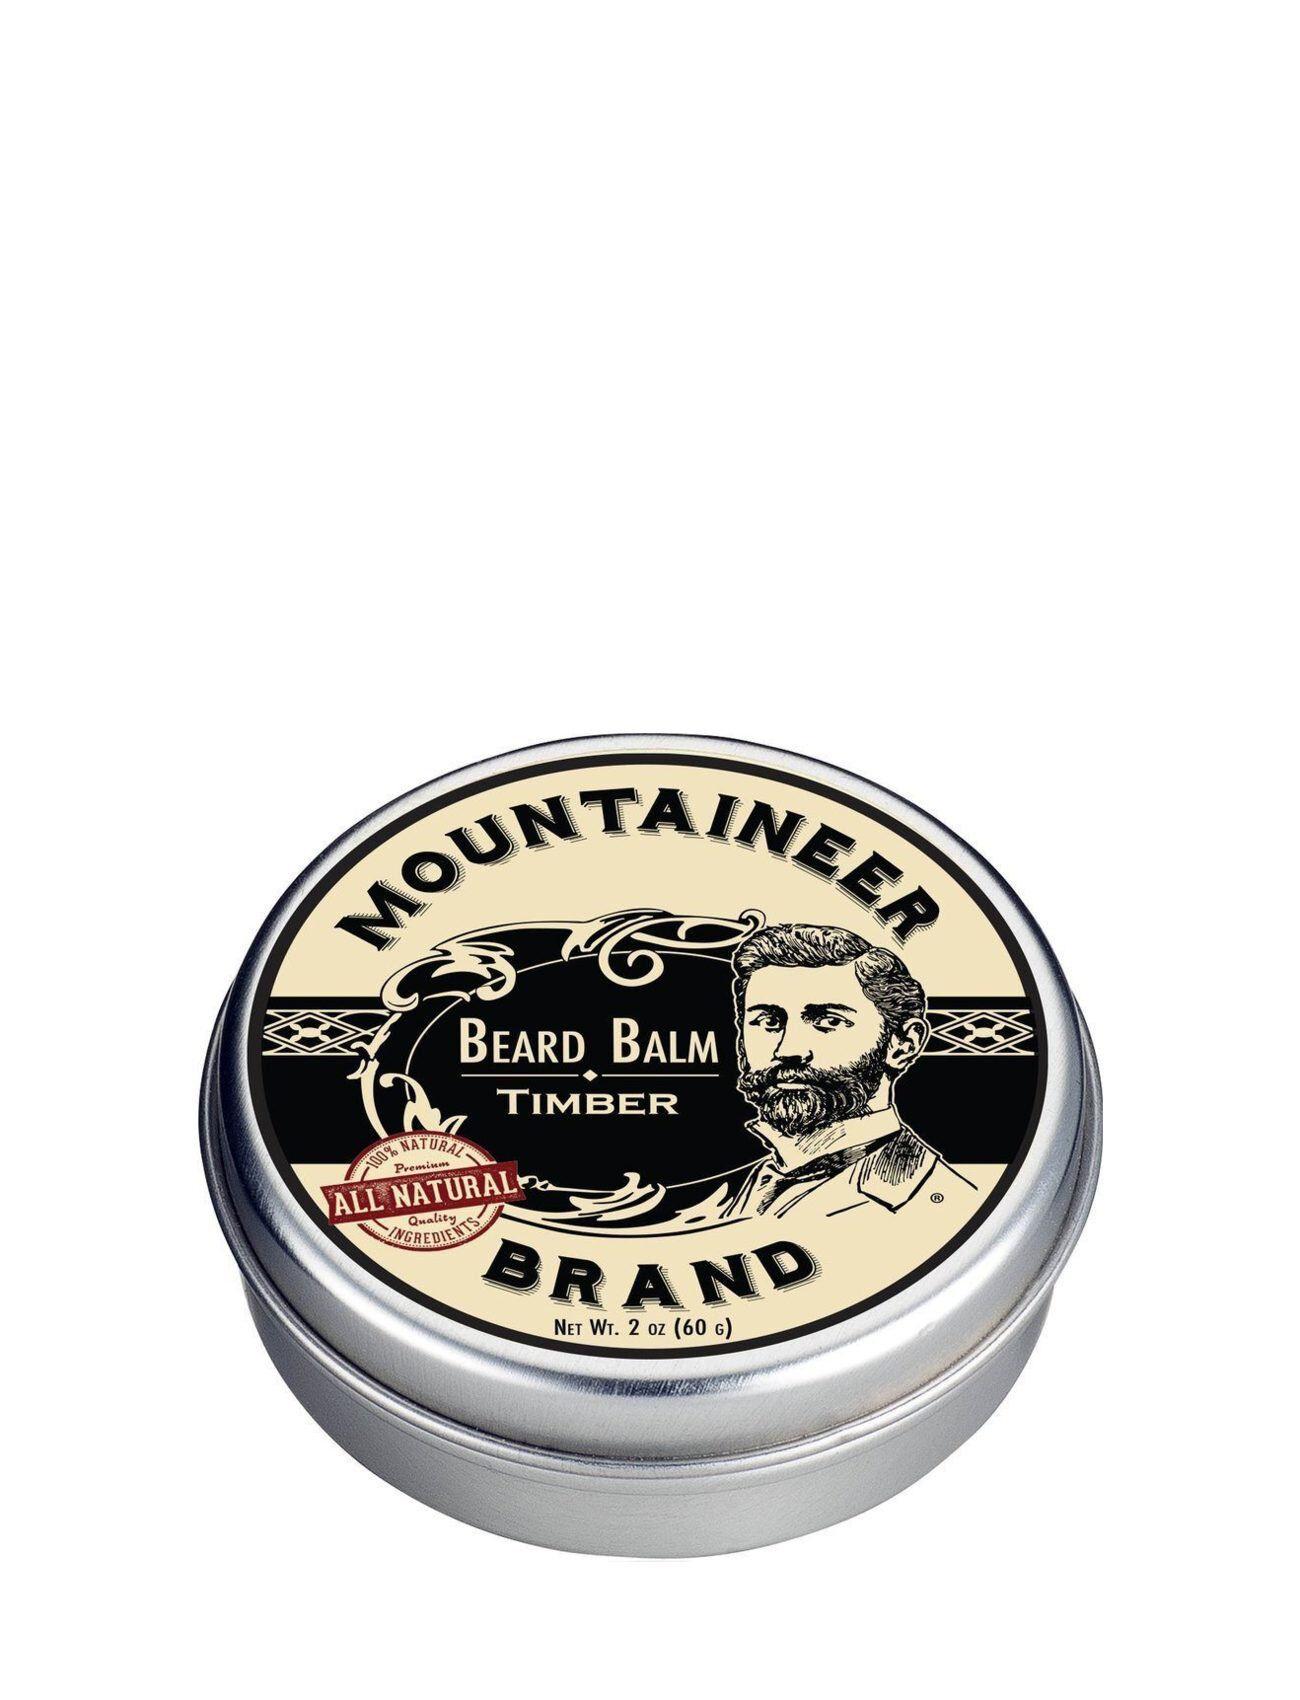 Mountaineer Brand Magic Timber Beard Balm Beauty MEN Shaving Products Beard & Mustache Nude Mountaineer Brand